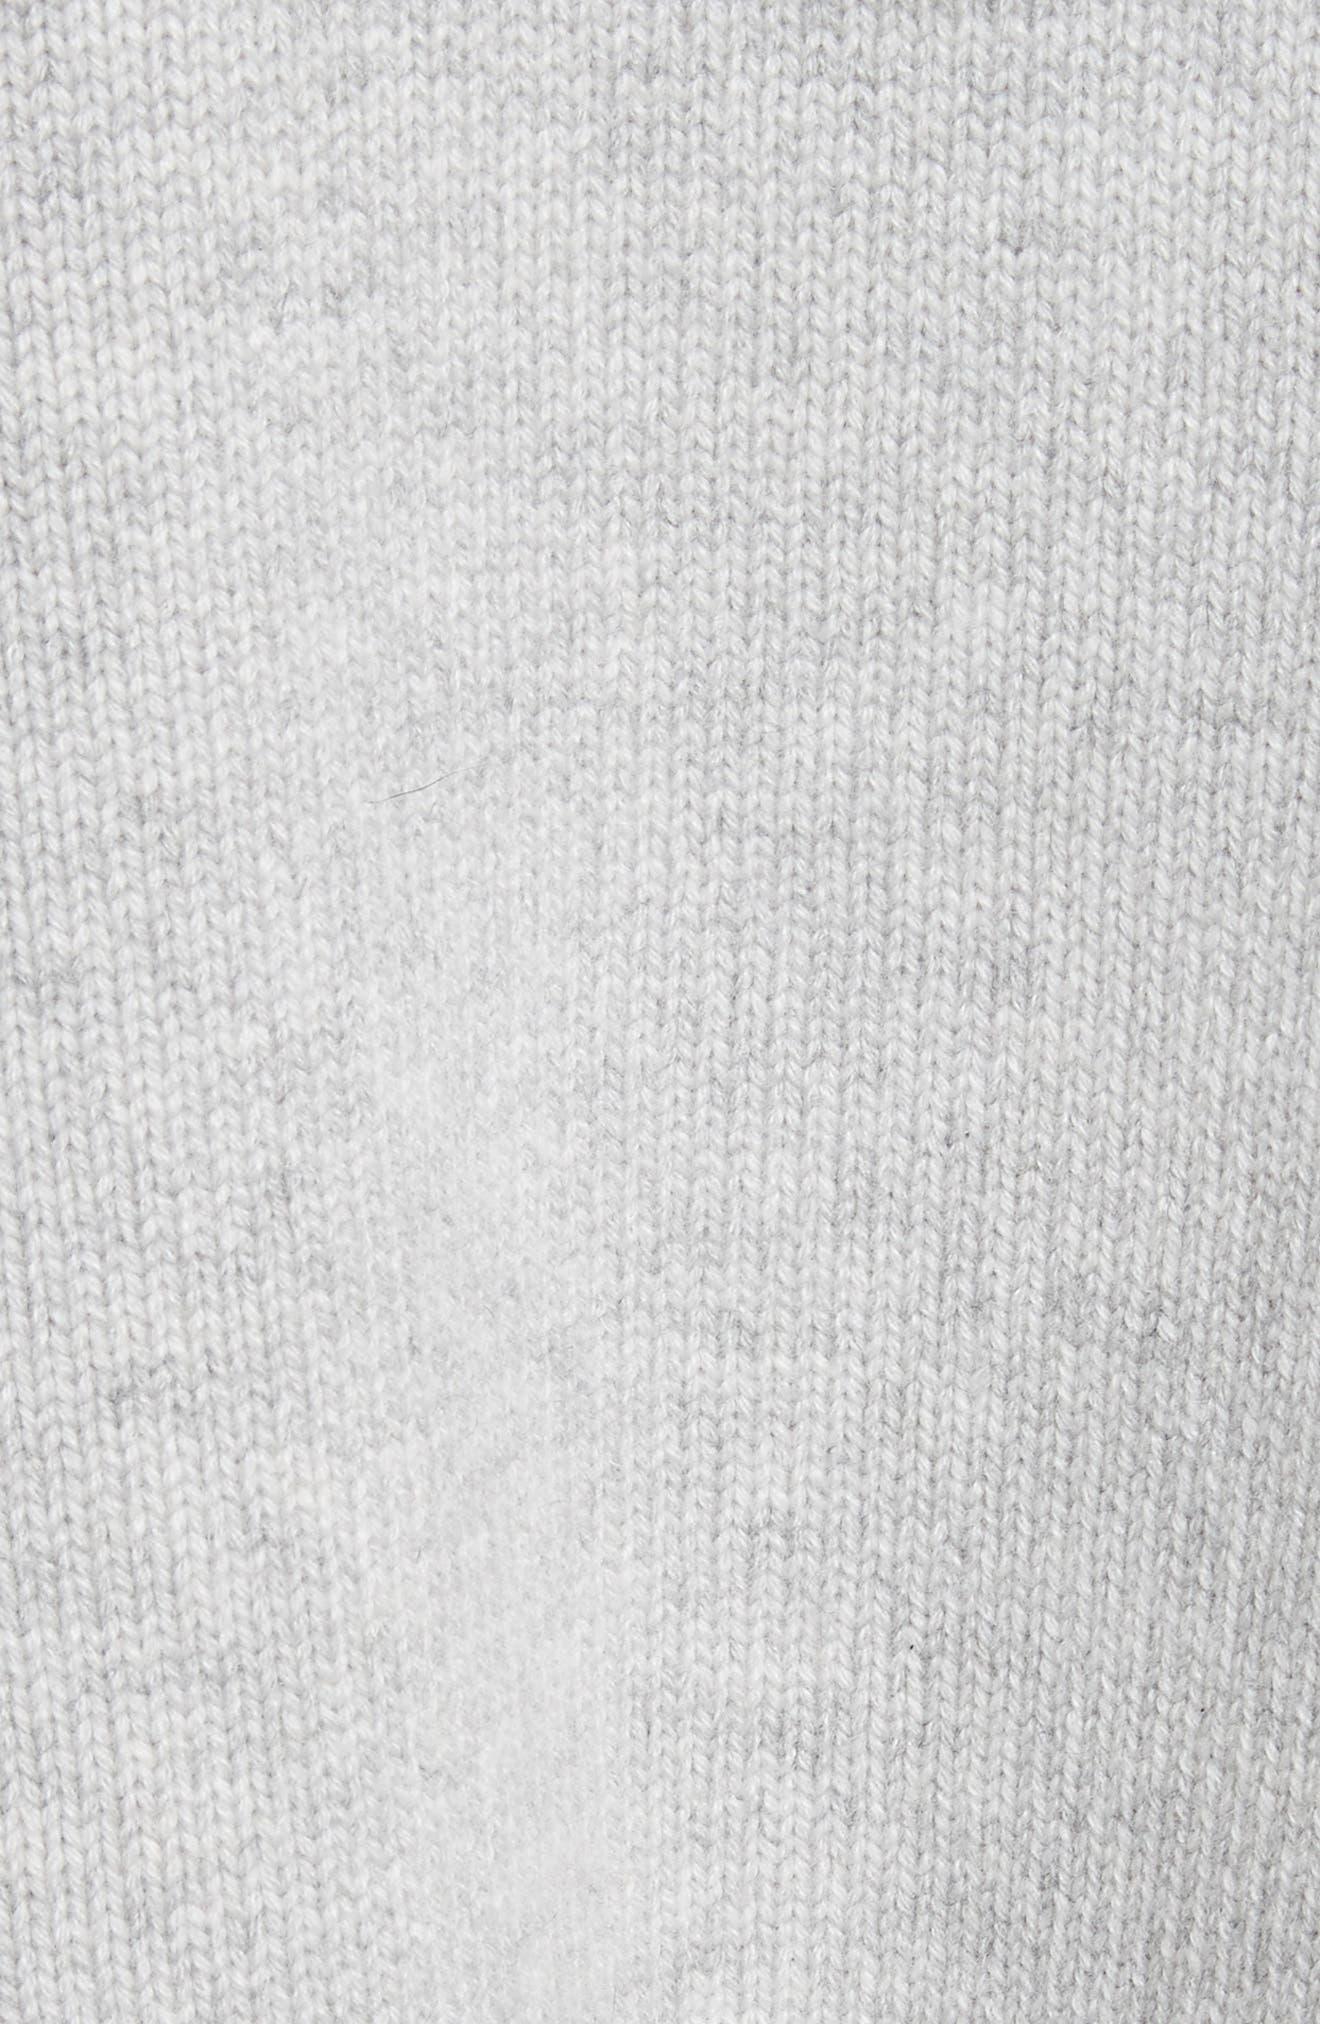 Blouson Sleeve Cashmere Hoodie,                             Alternate thumbnail 6, color,                             Heather Grey